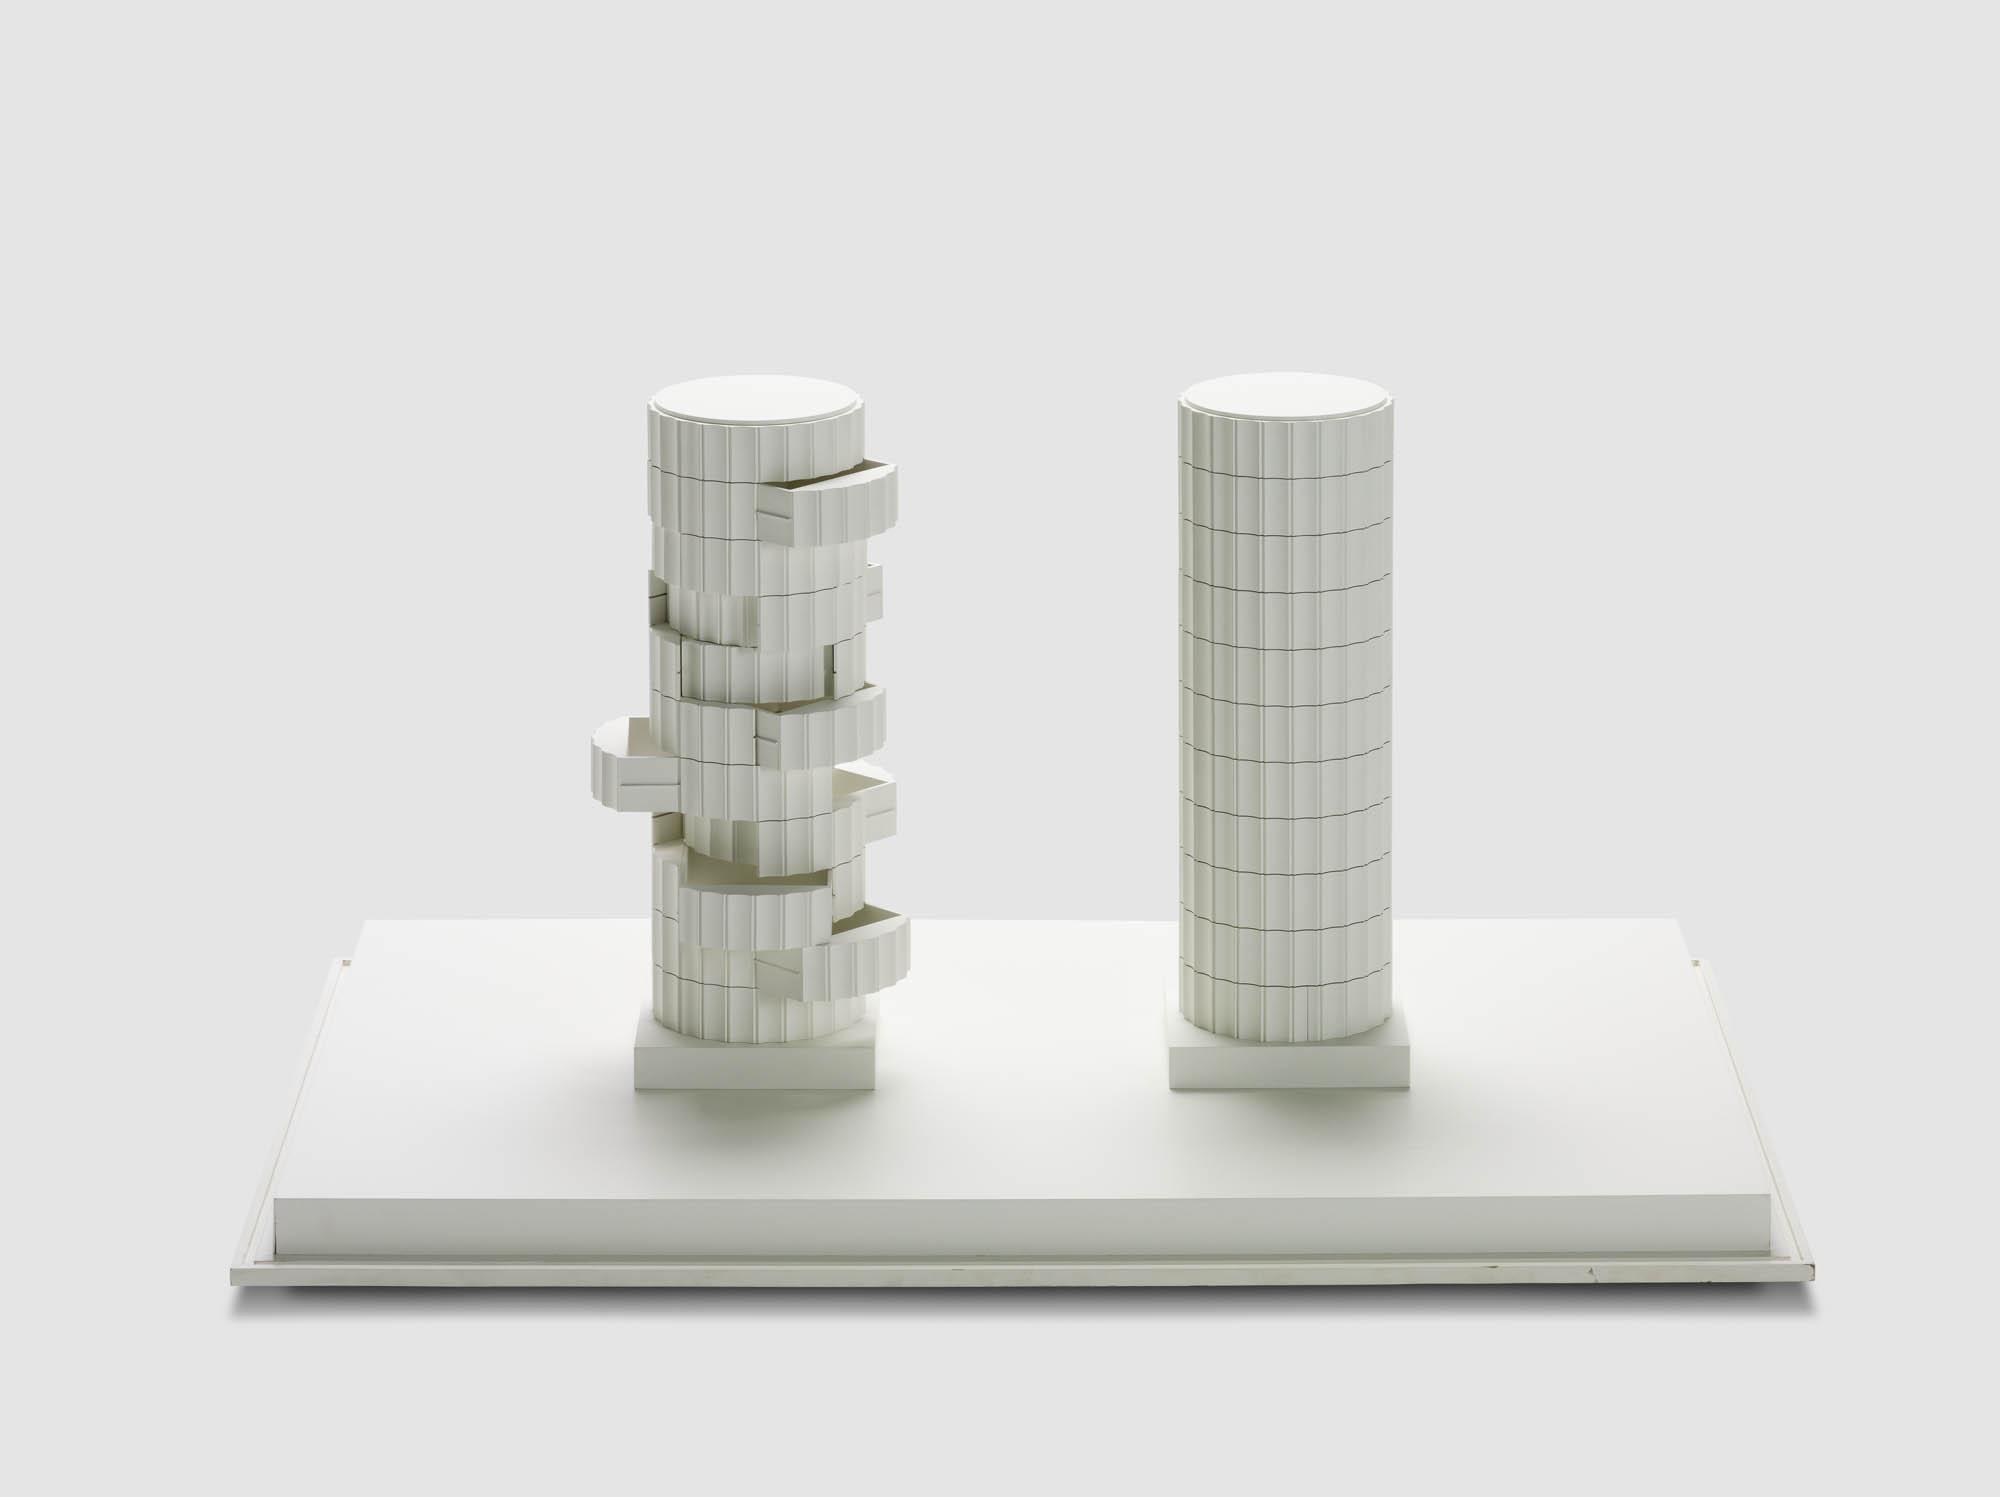 Säulenstumpf Robert Haussmann Trix Haussmann Storage unit